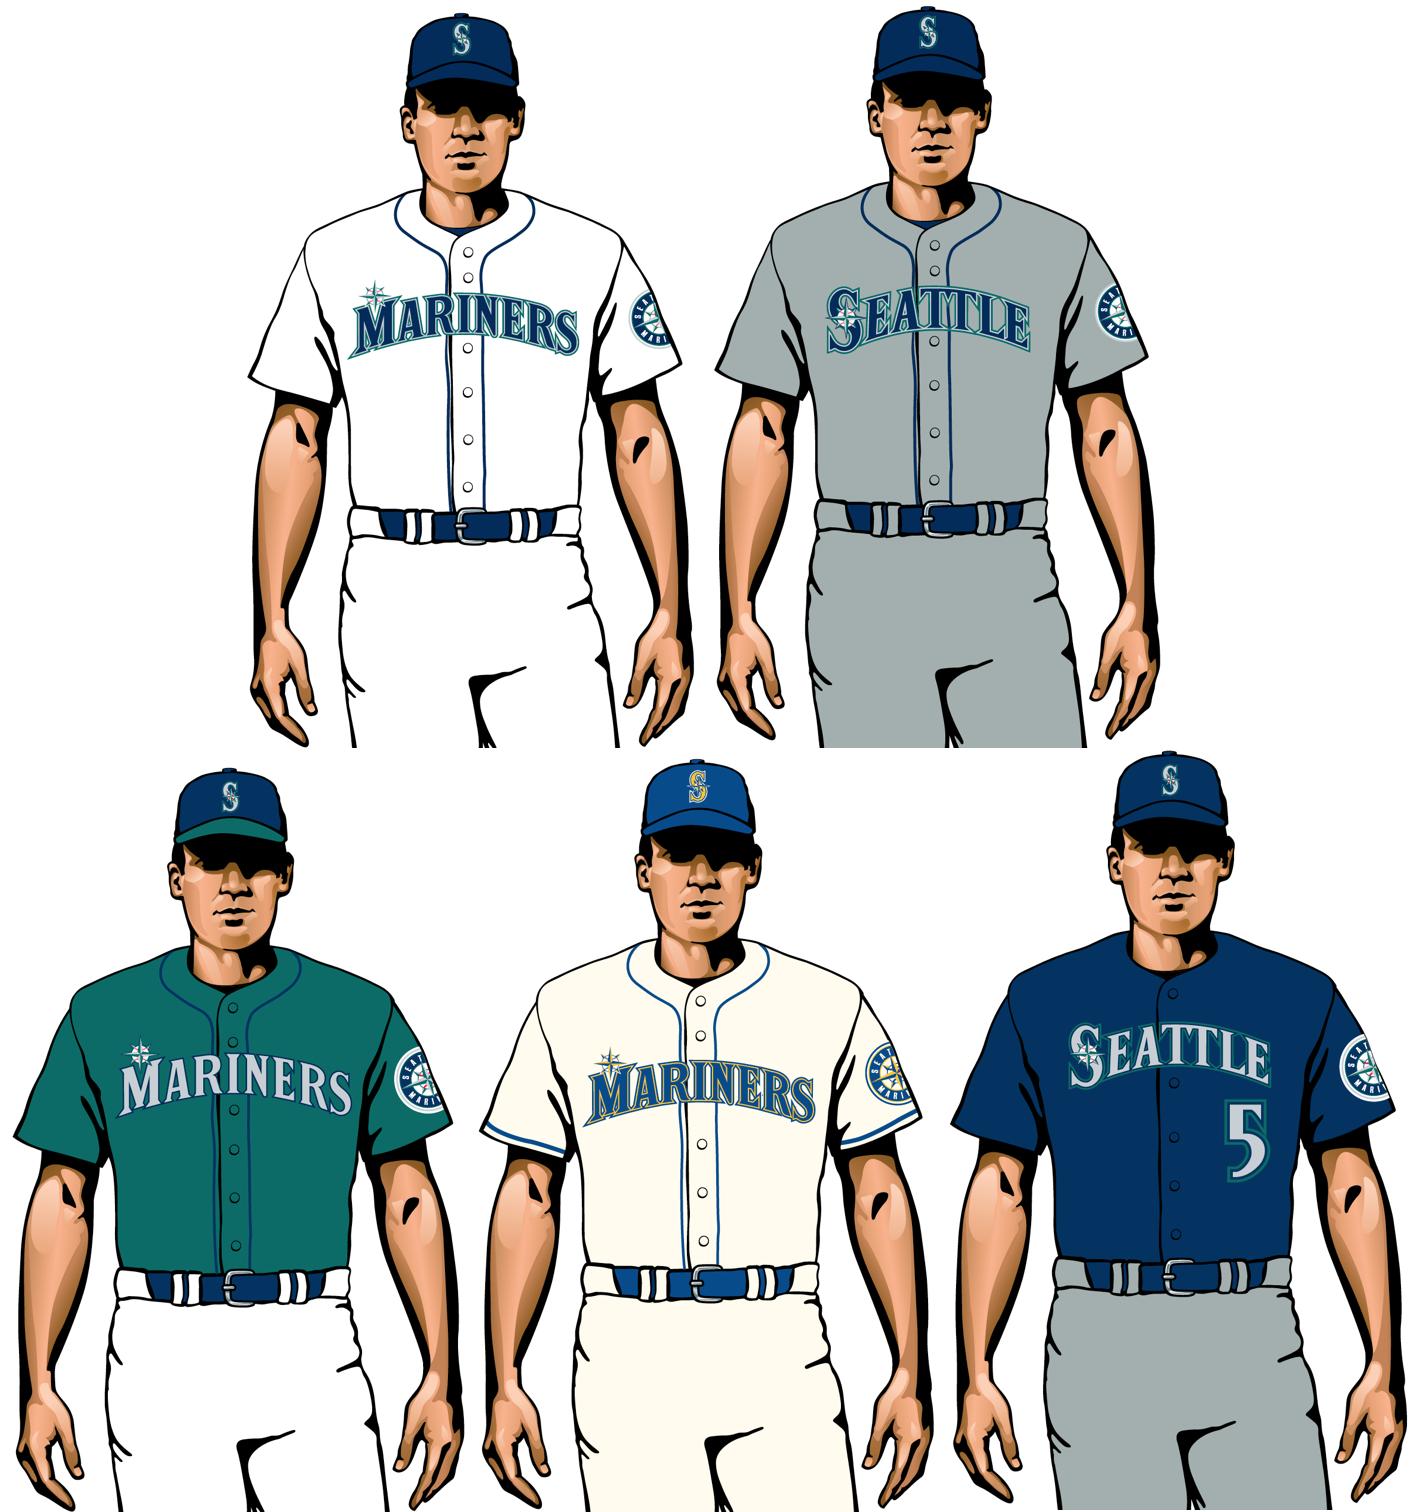 marineros de seattle 2020 uniformes